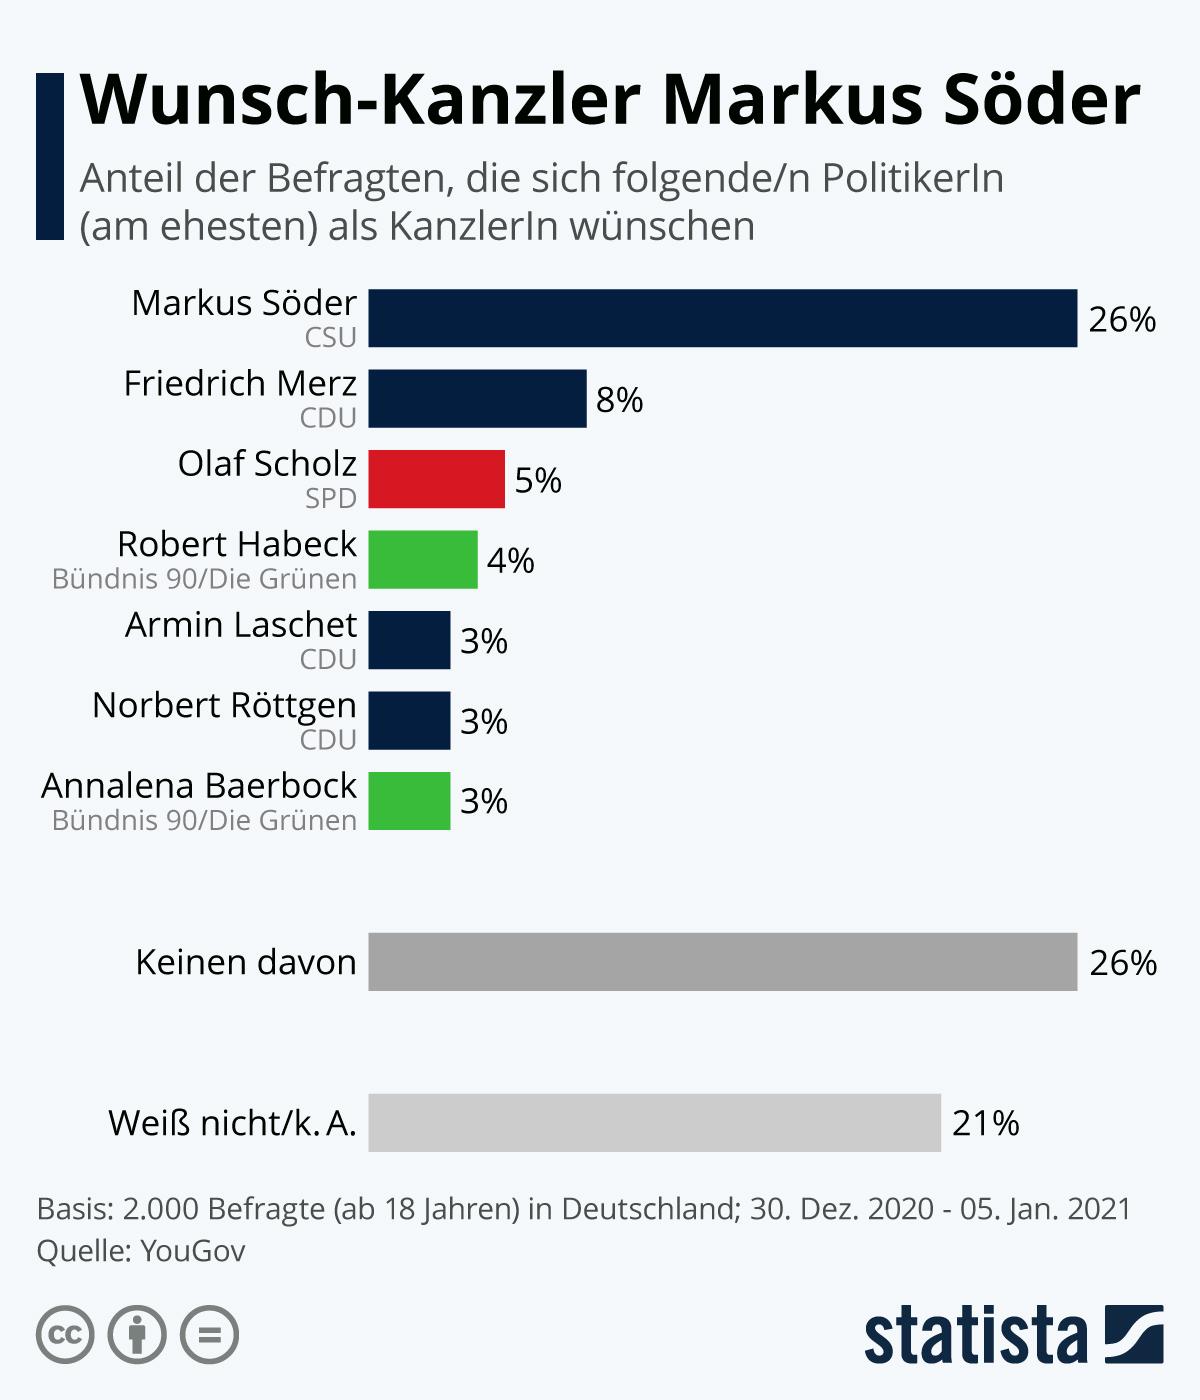 Infografik: Wunsch-Kanzler Markus Söder | Statista